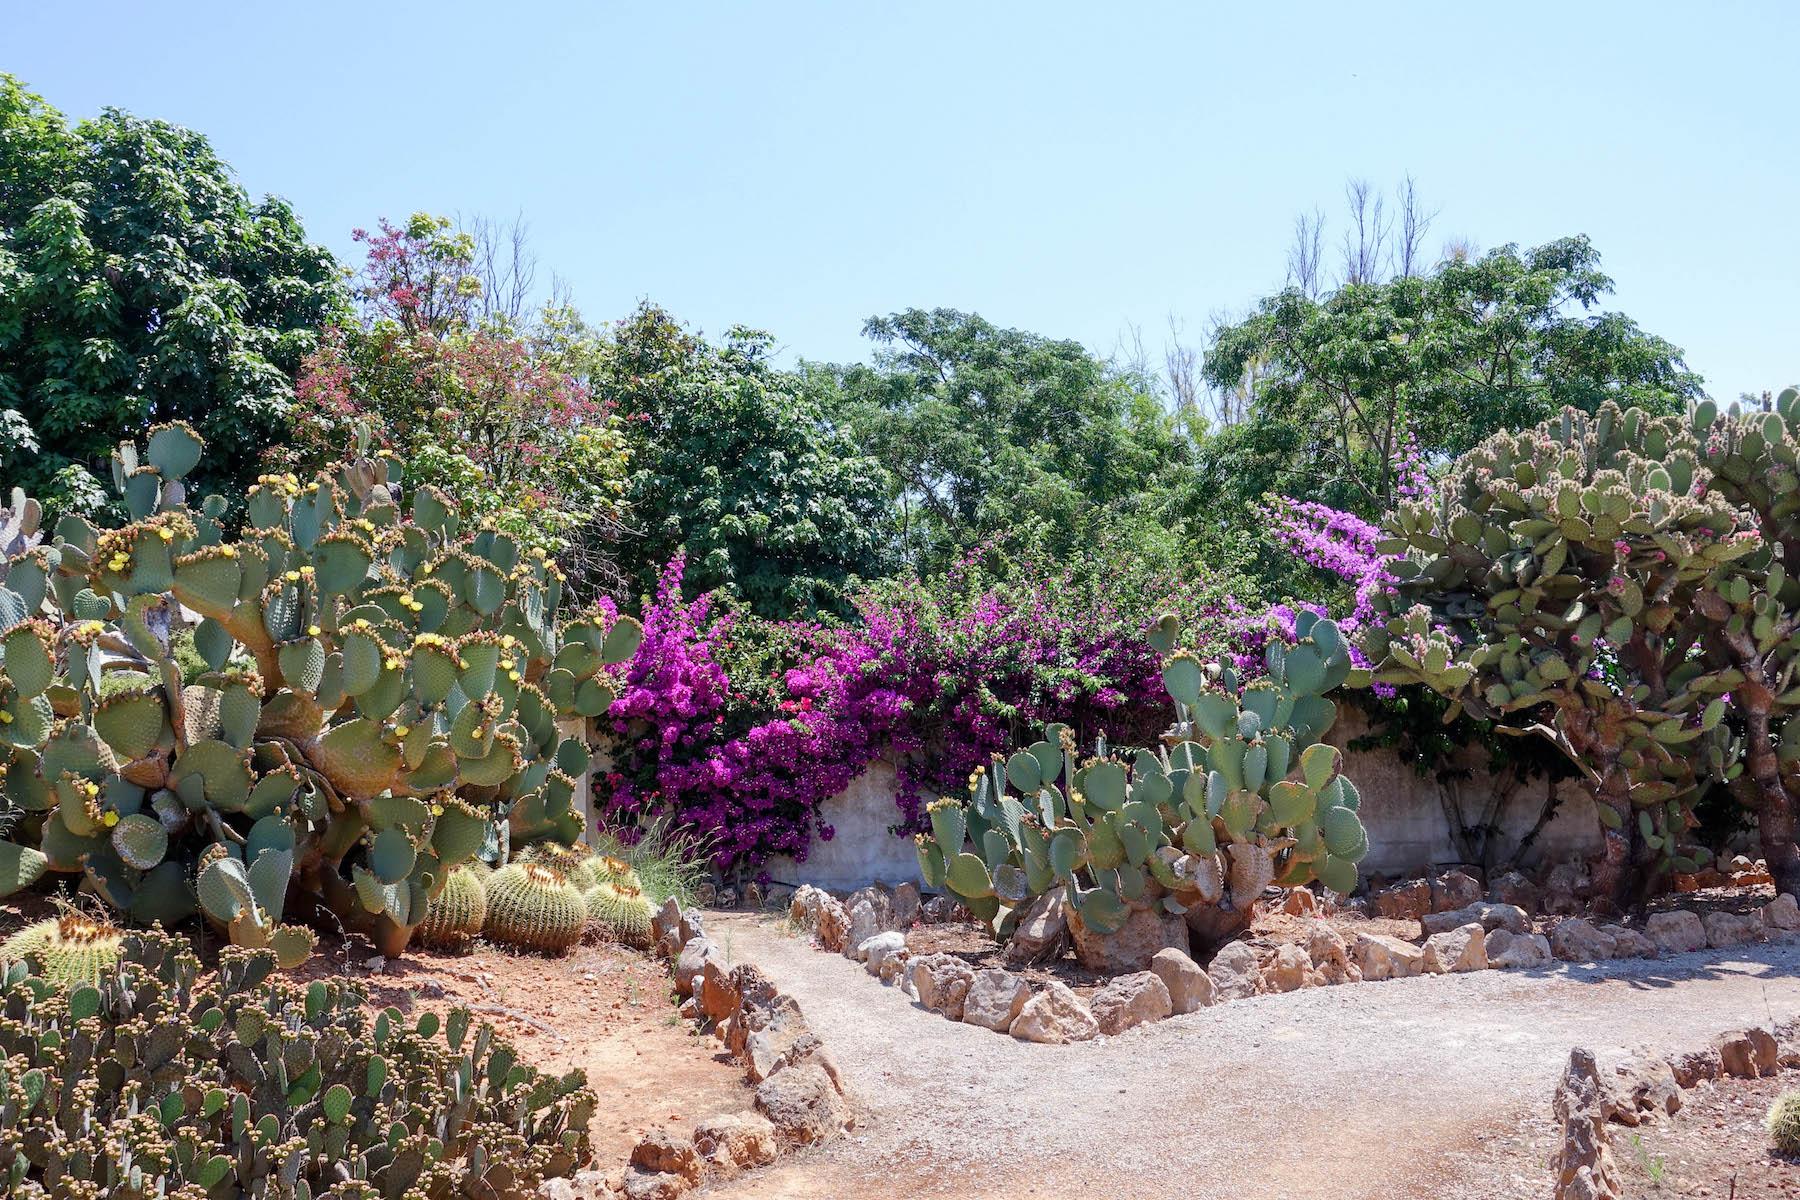 suelovesnyc_susan_Fengler_botanicactus_mallorca_kaktus_botanischer_garten_mallorca